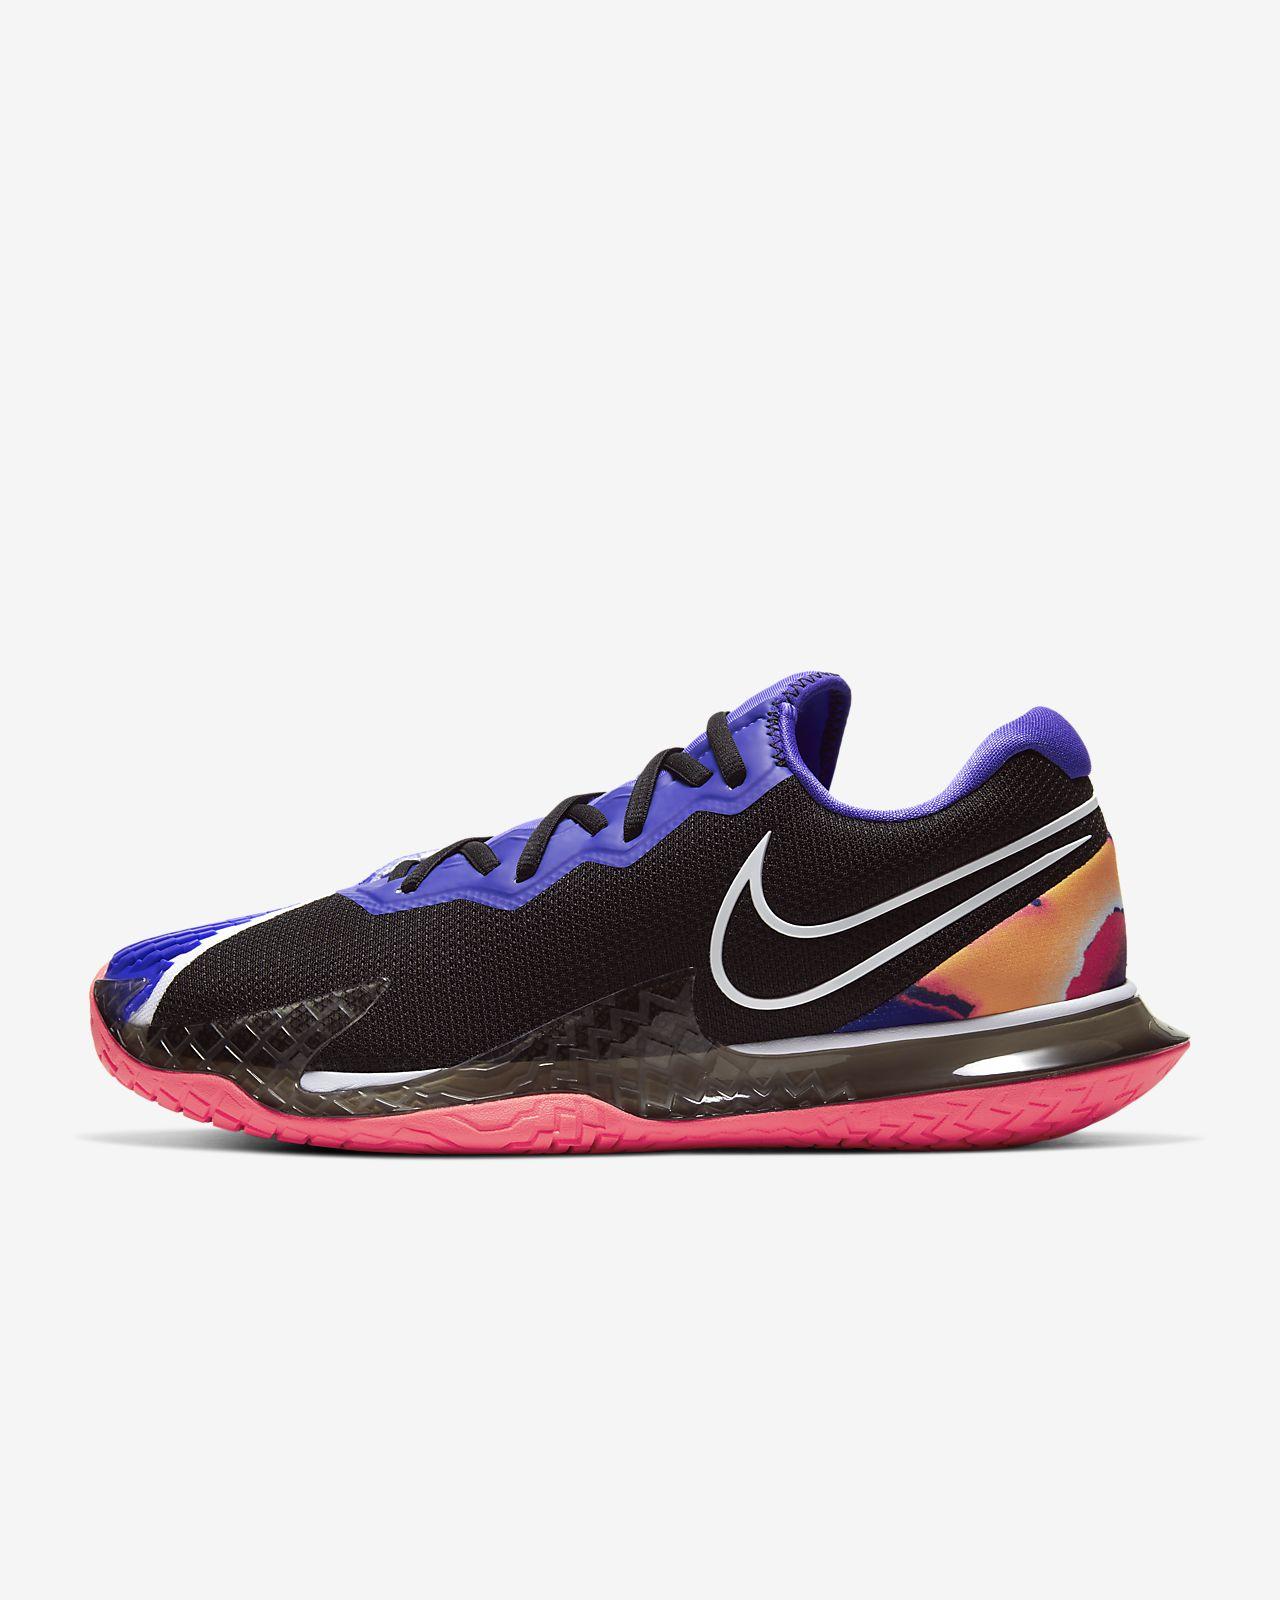 Nike Air Max 97 PurpleBlack Pink Green